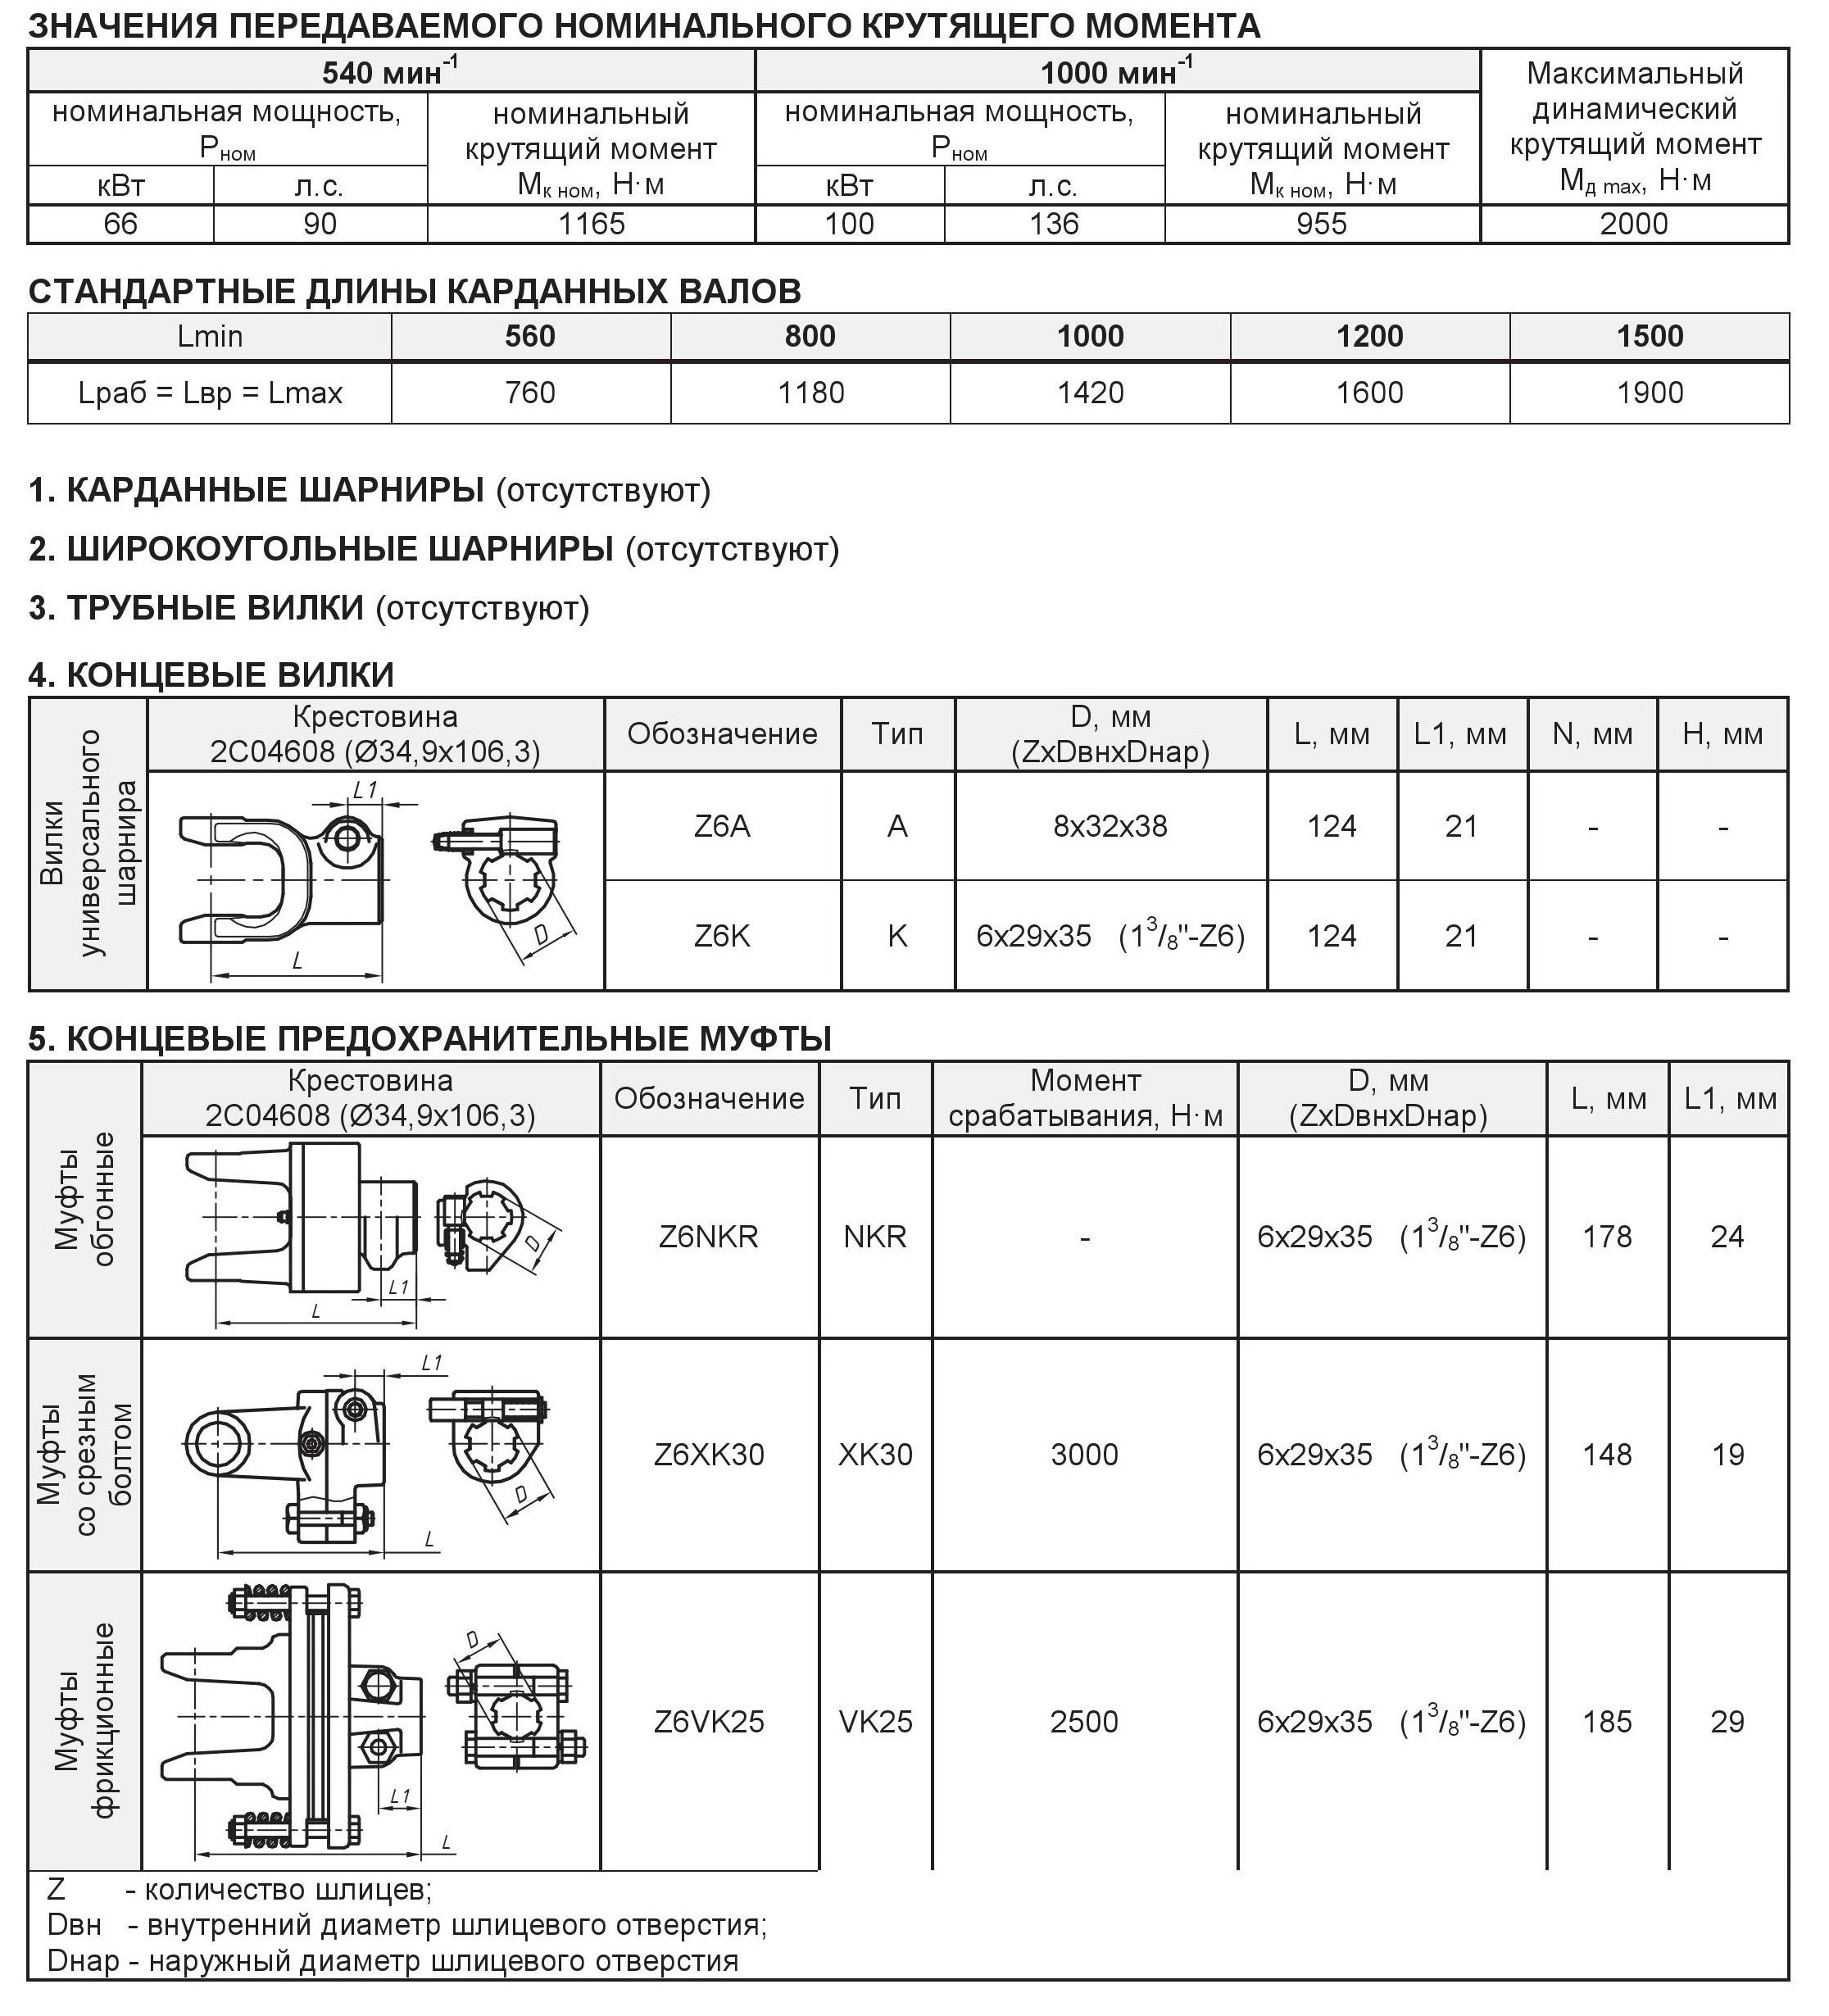 Элементы карданных валов (карданов) типа Z6